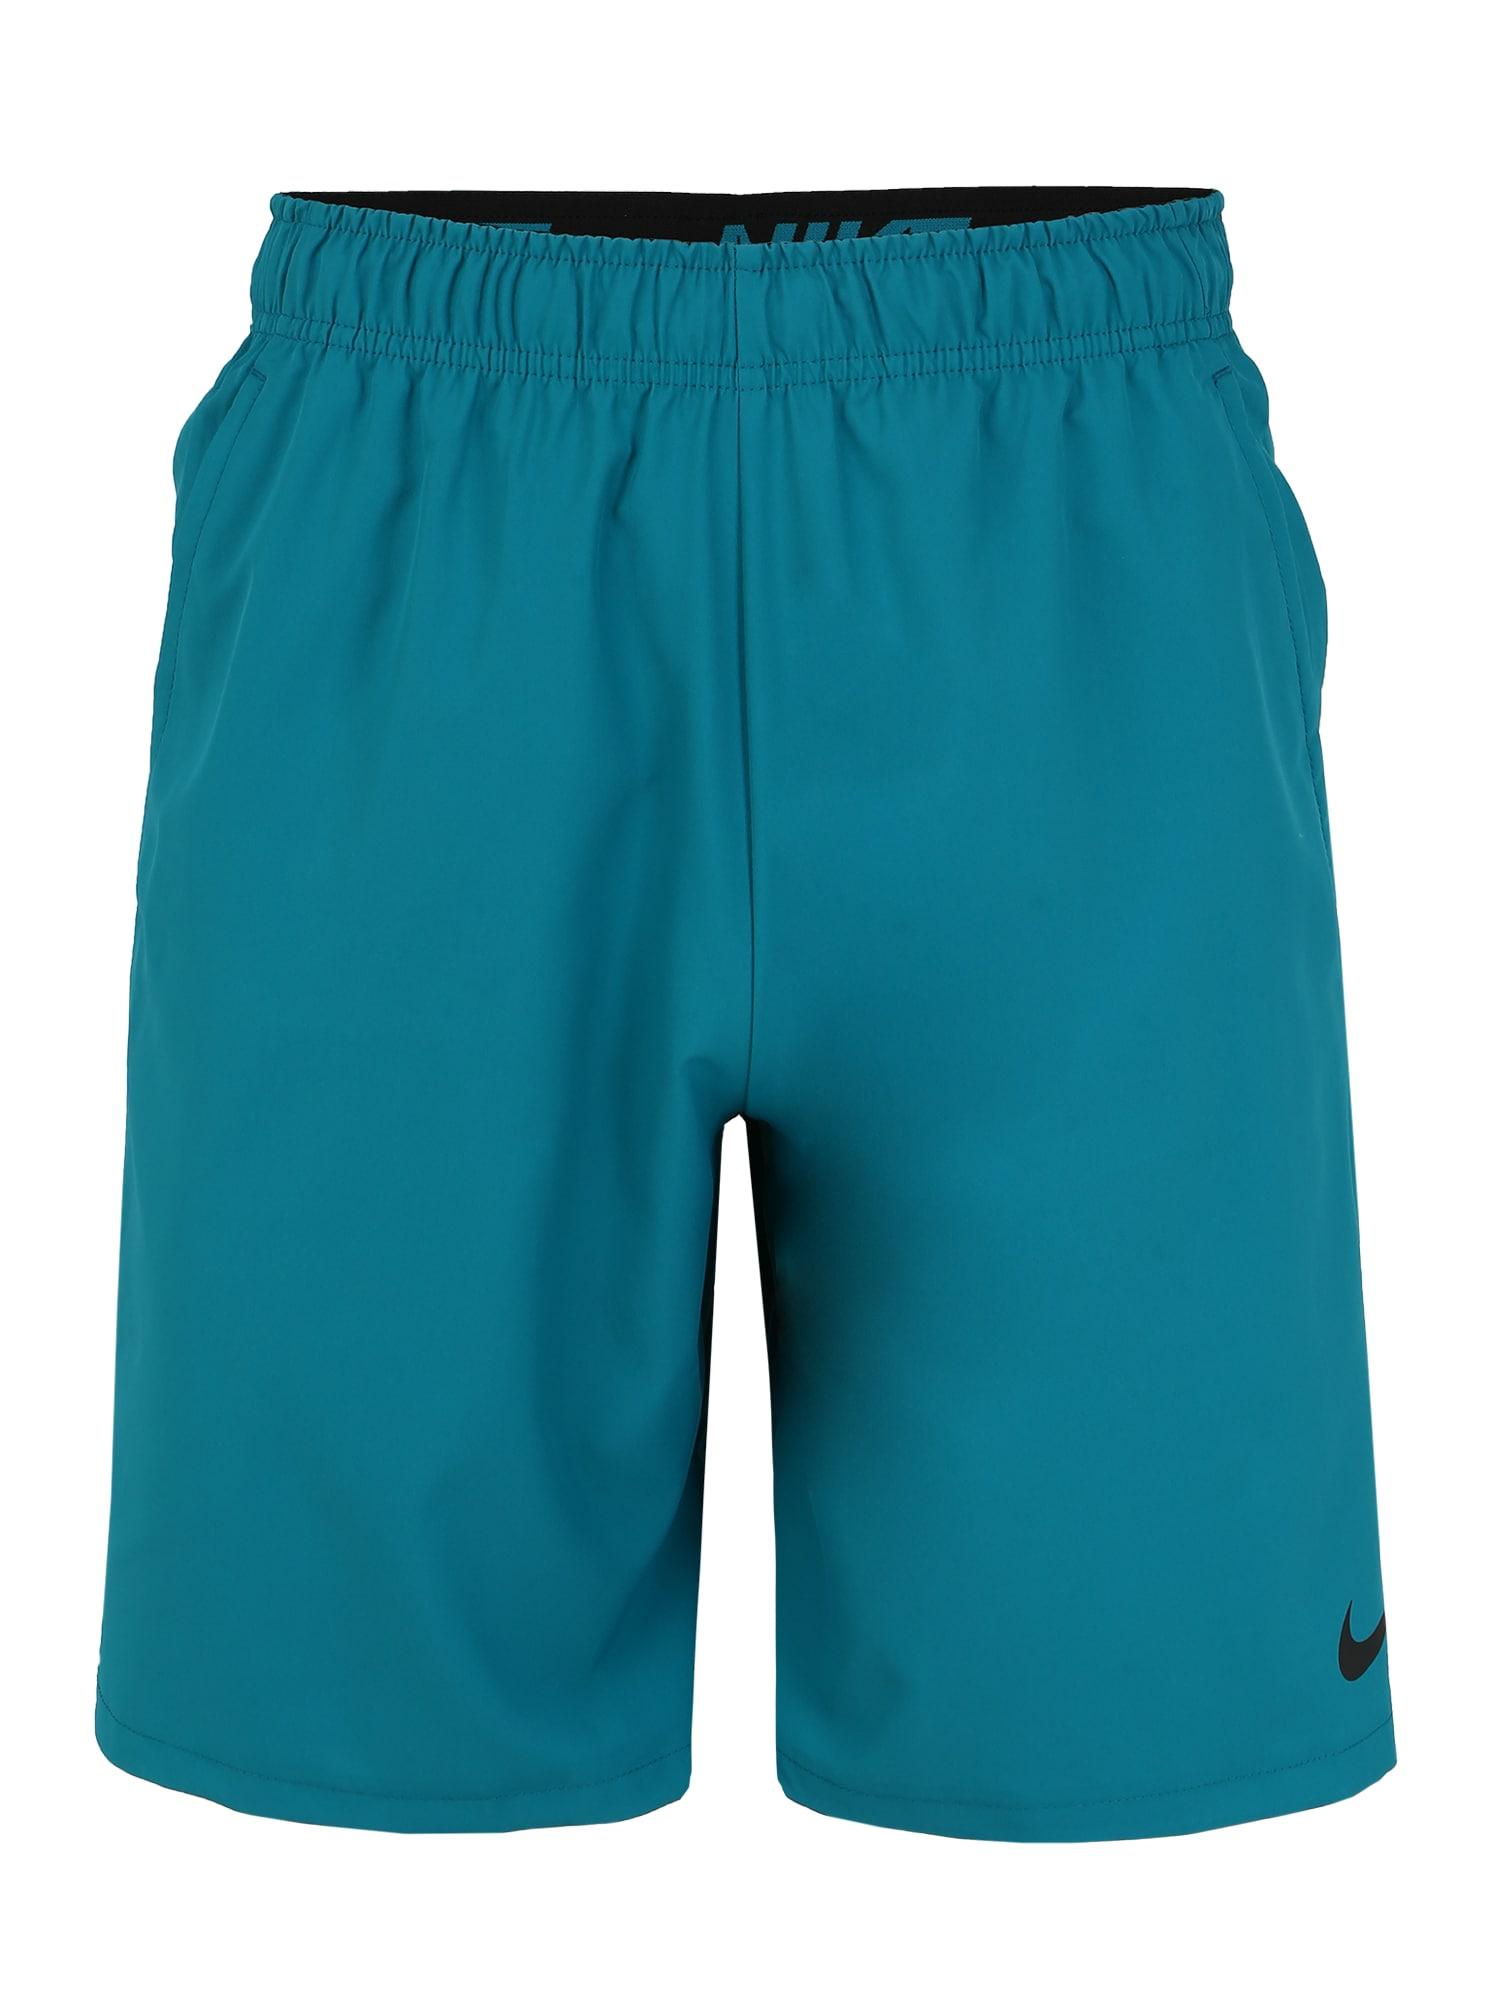 NIKE Športové nohavice 'Nike Flex'  modré